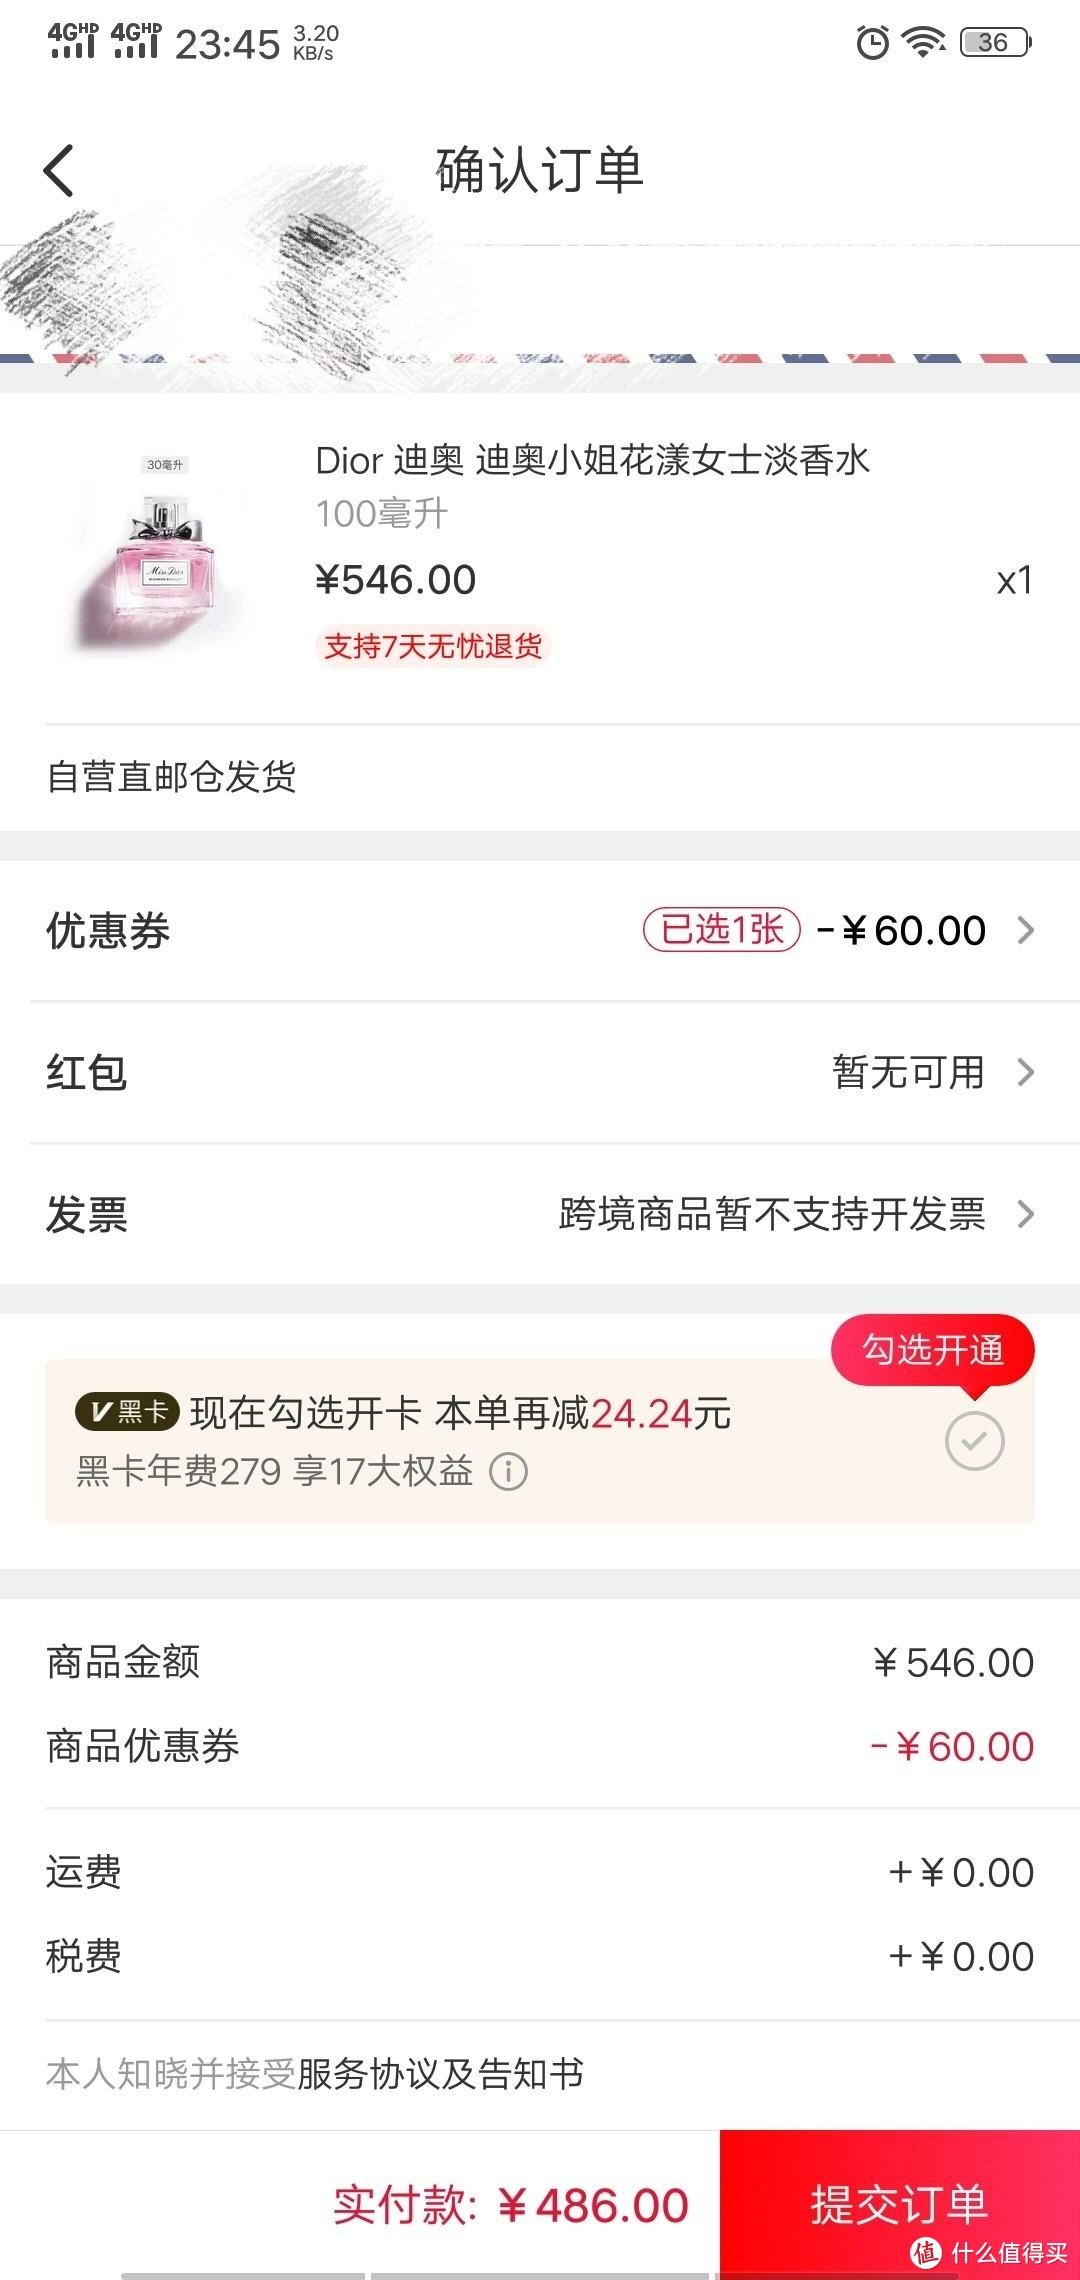 Dior花漾甜心100ml香水神价486